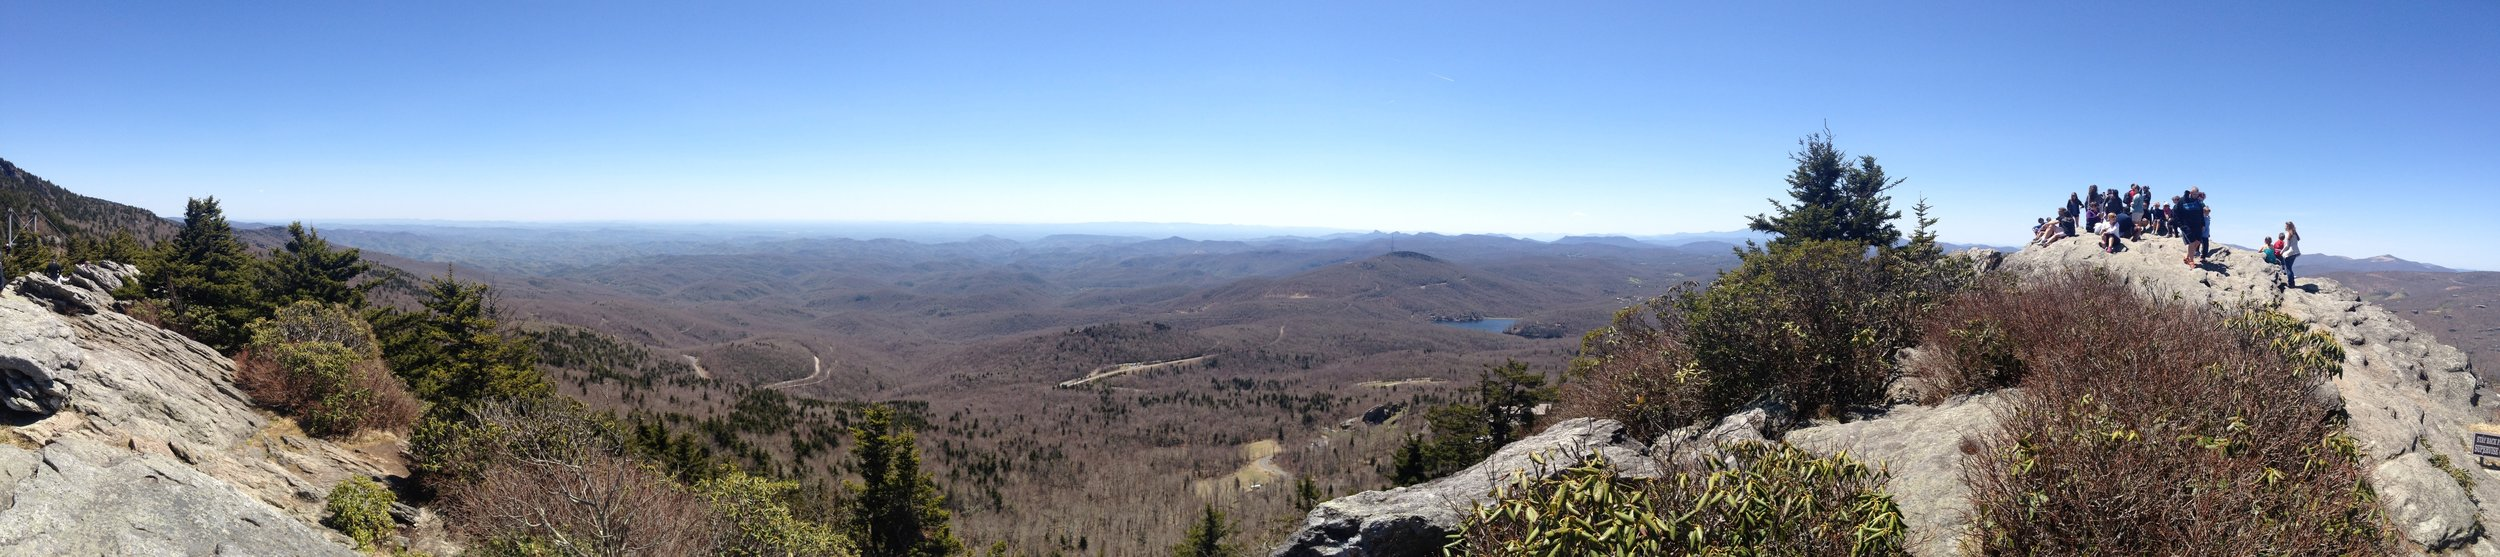 Banner Image - Mountains.jpeg